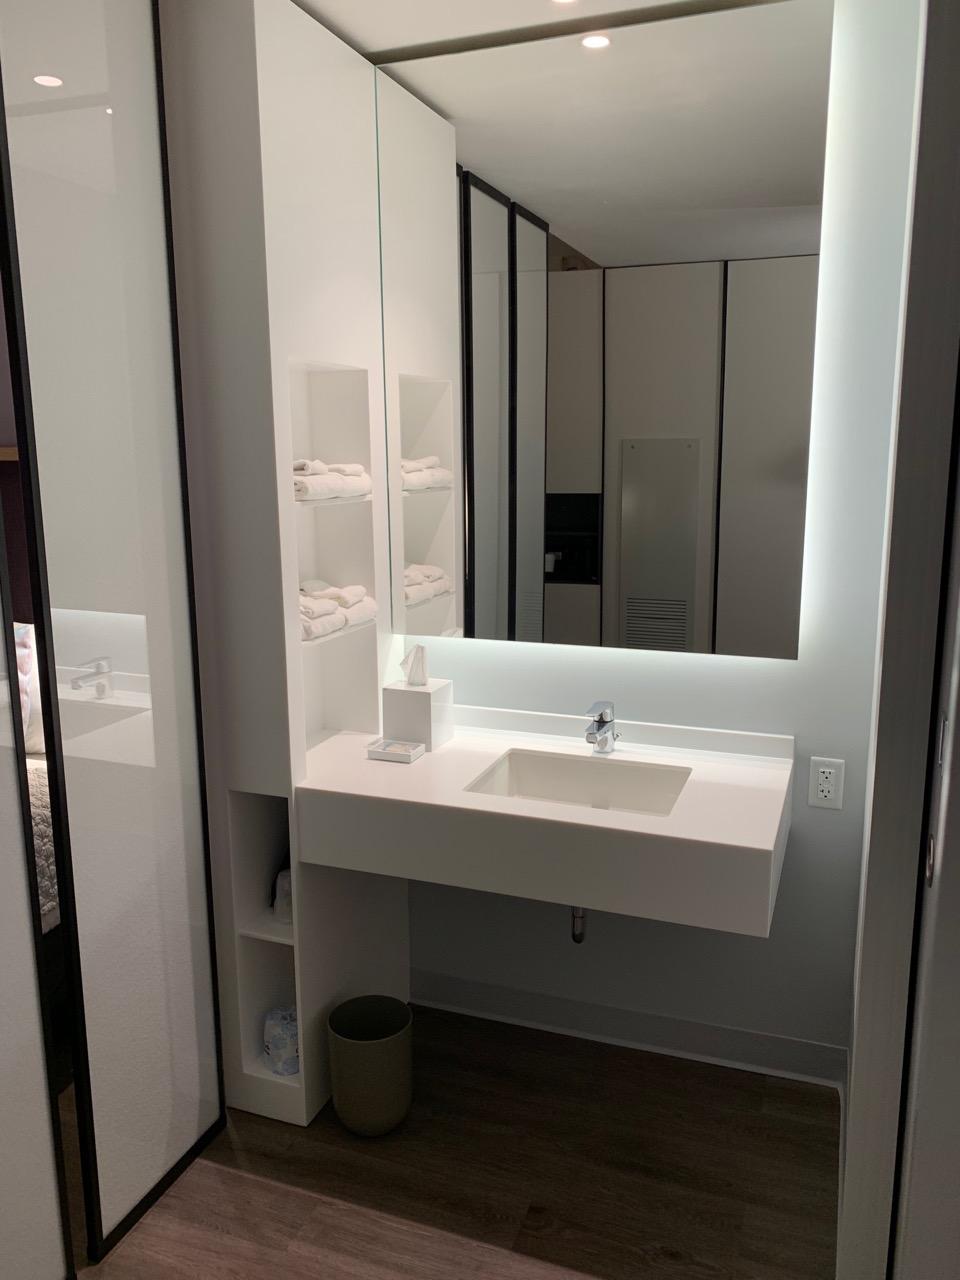 universal aventura hotel review bathroom 1.jpeg